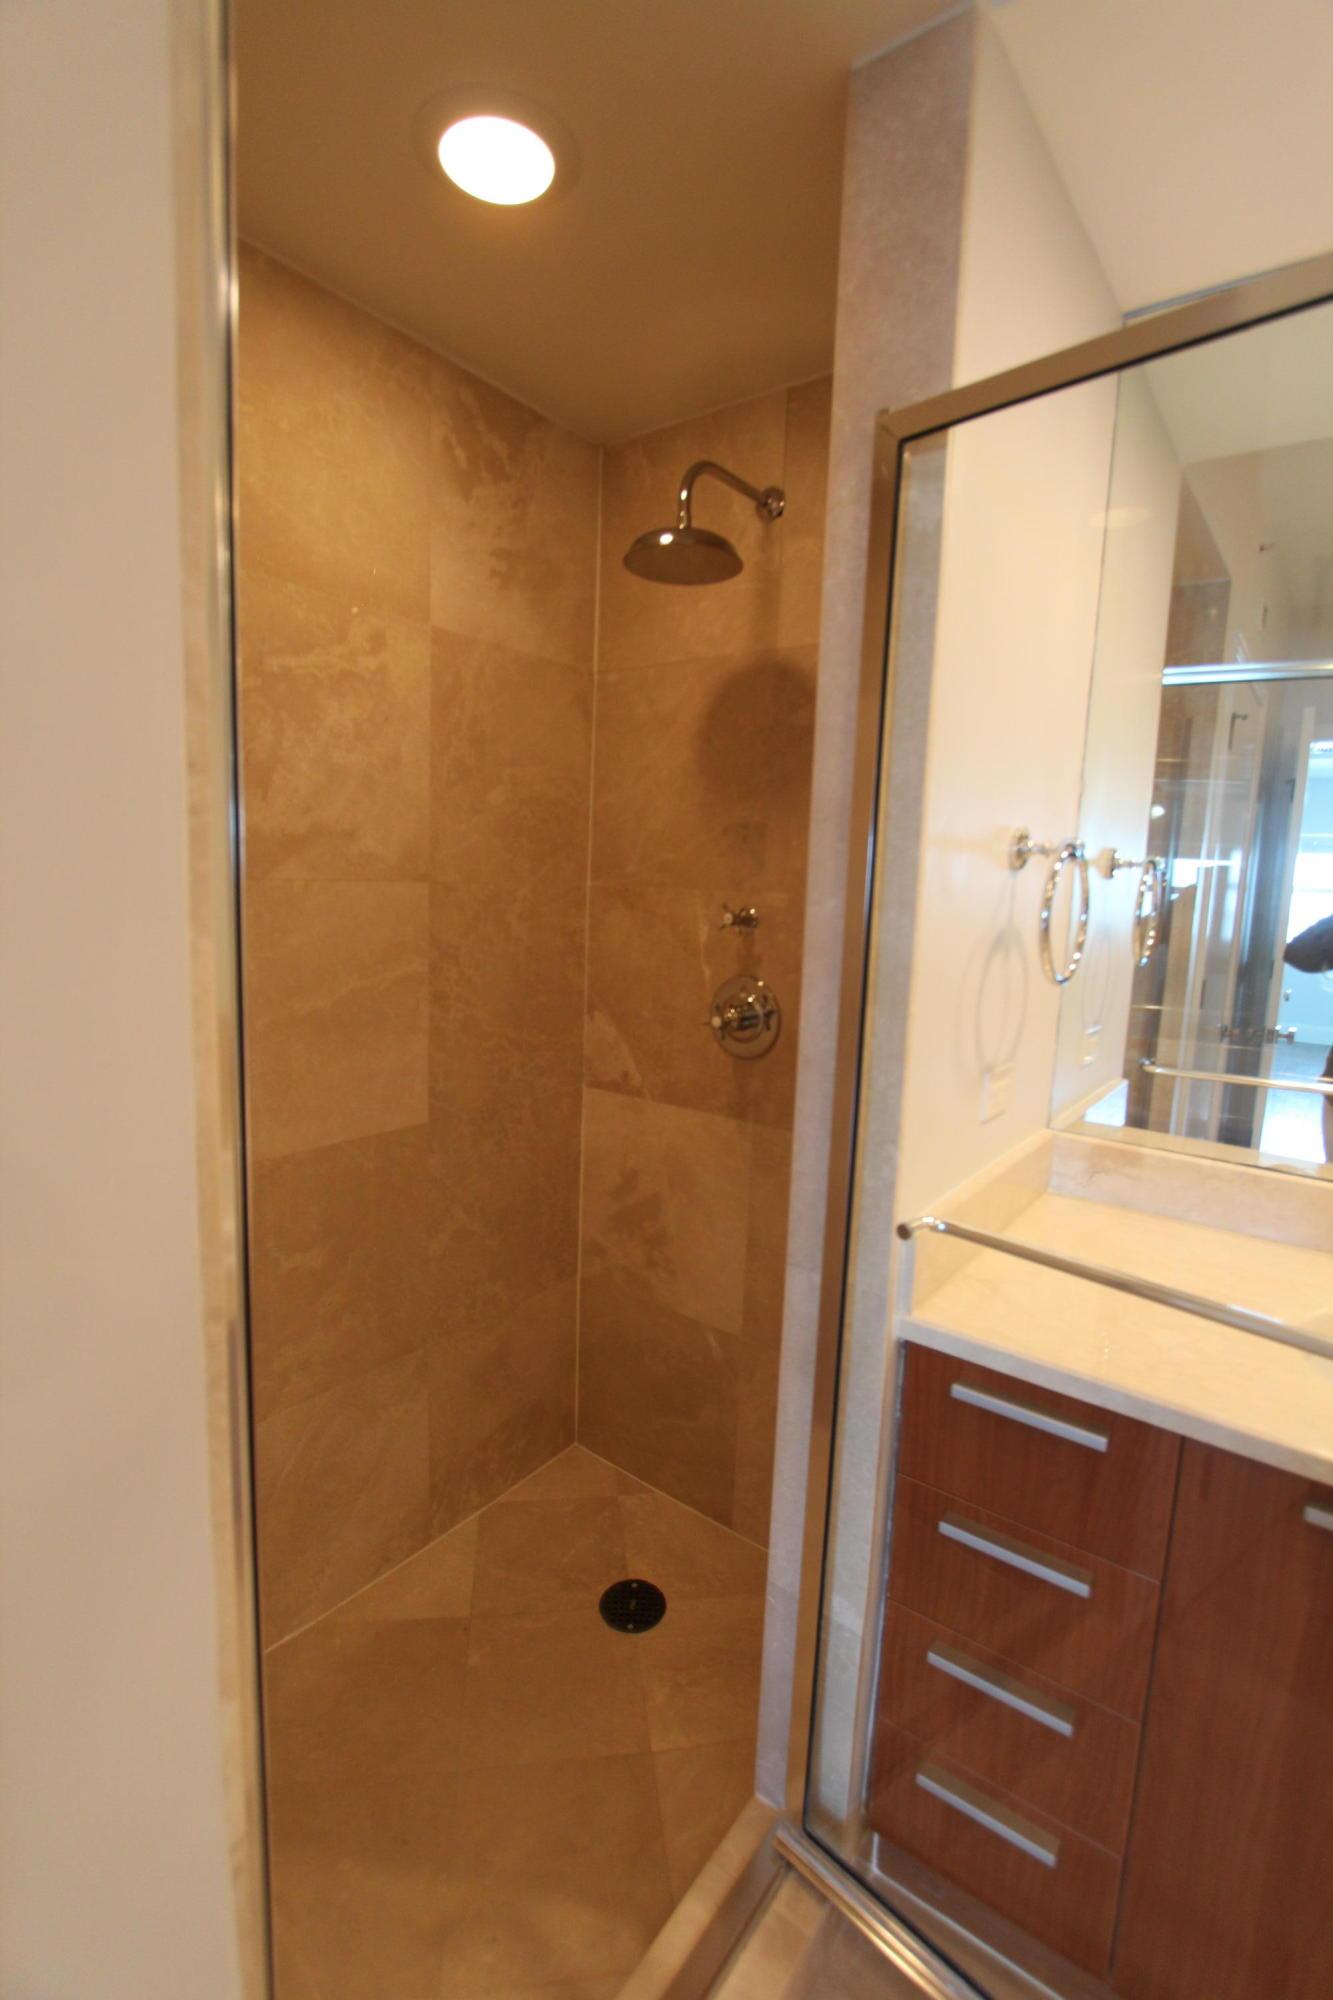 2650 Lakeshore Drive 1602, Riviera Beach, Florida 33404, 2 Bedrooms Bedrooms, ,2.1 BathroomsBathrooms,A,Condominium,Lakeshore,RX-10531429